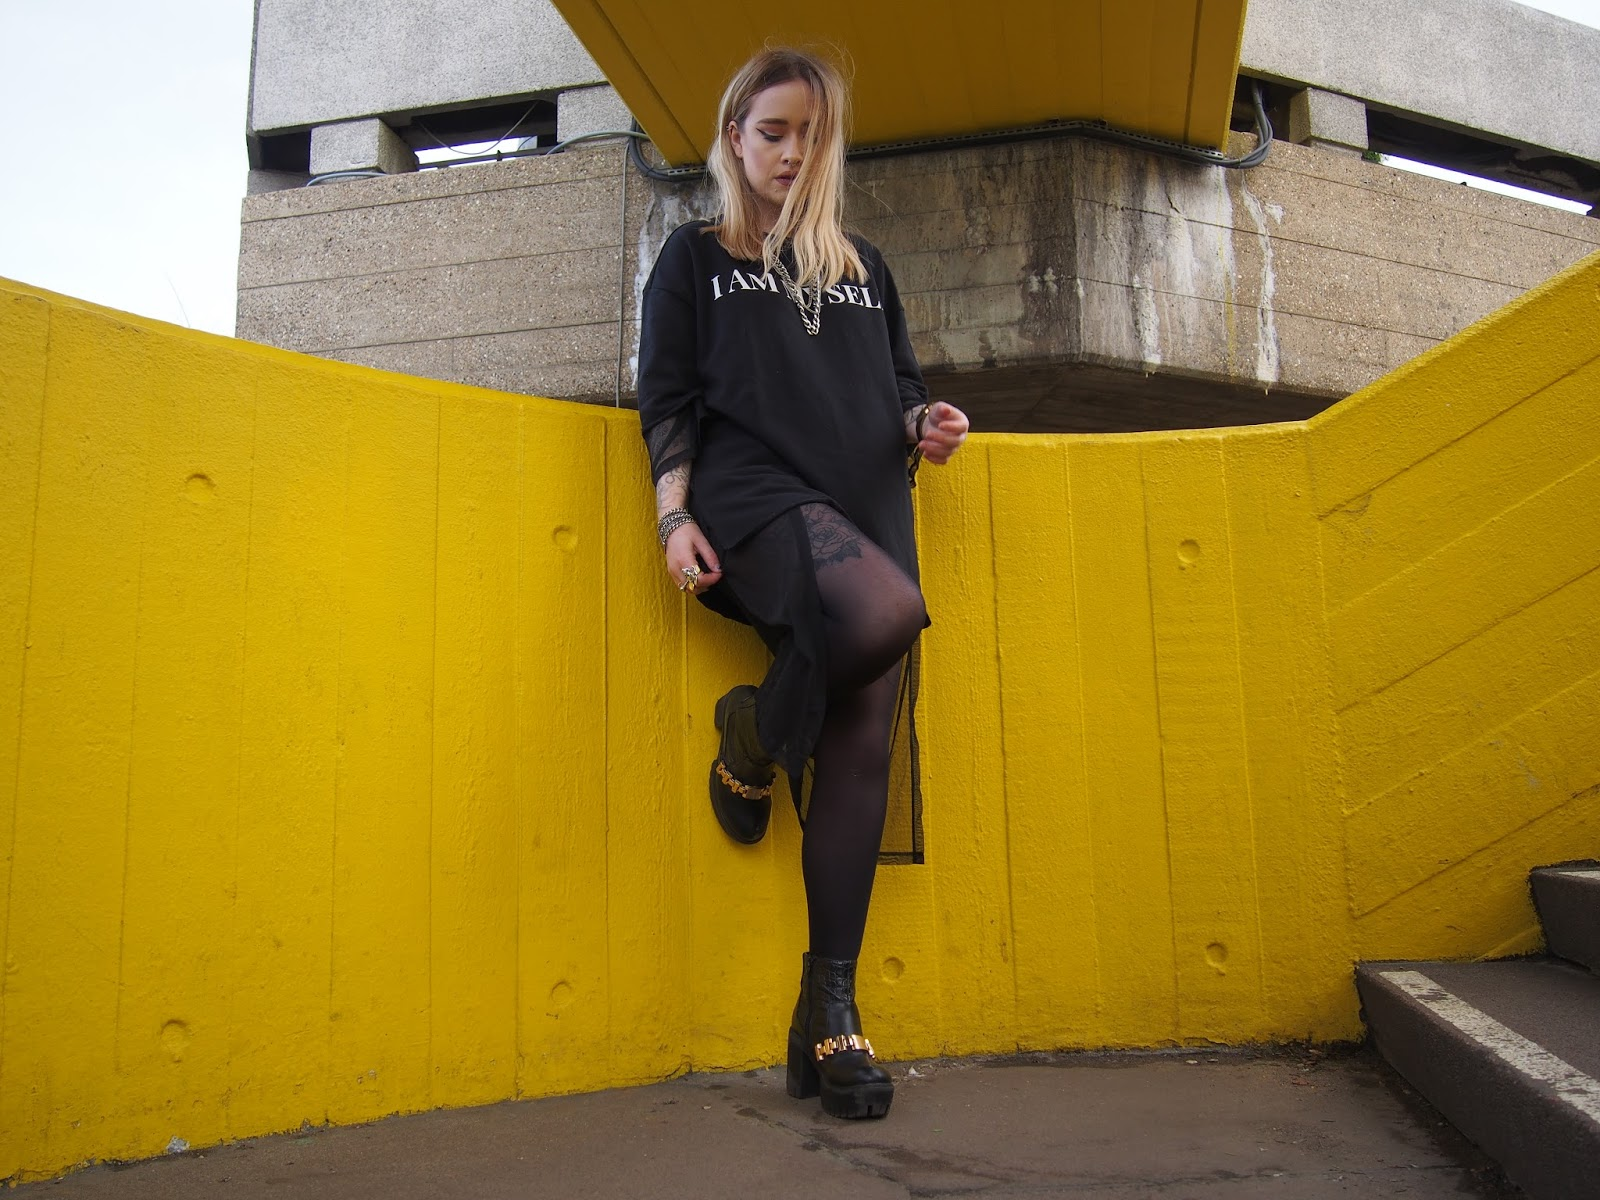 Fashion blogger Lucy Love styles up Zara oversized sweater dress